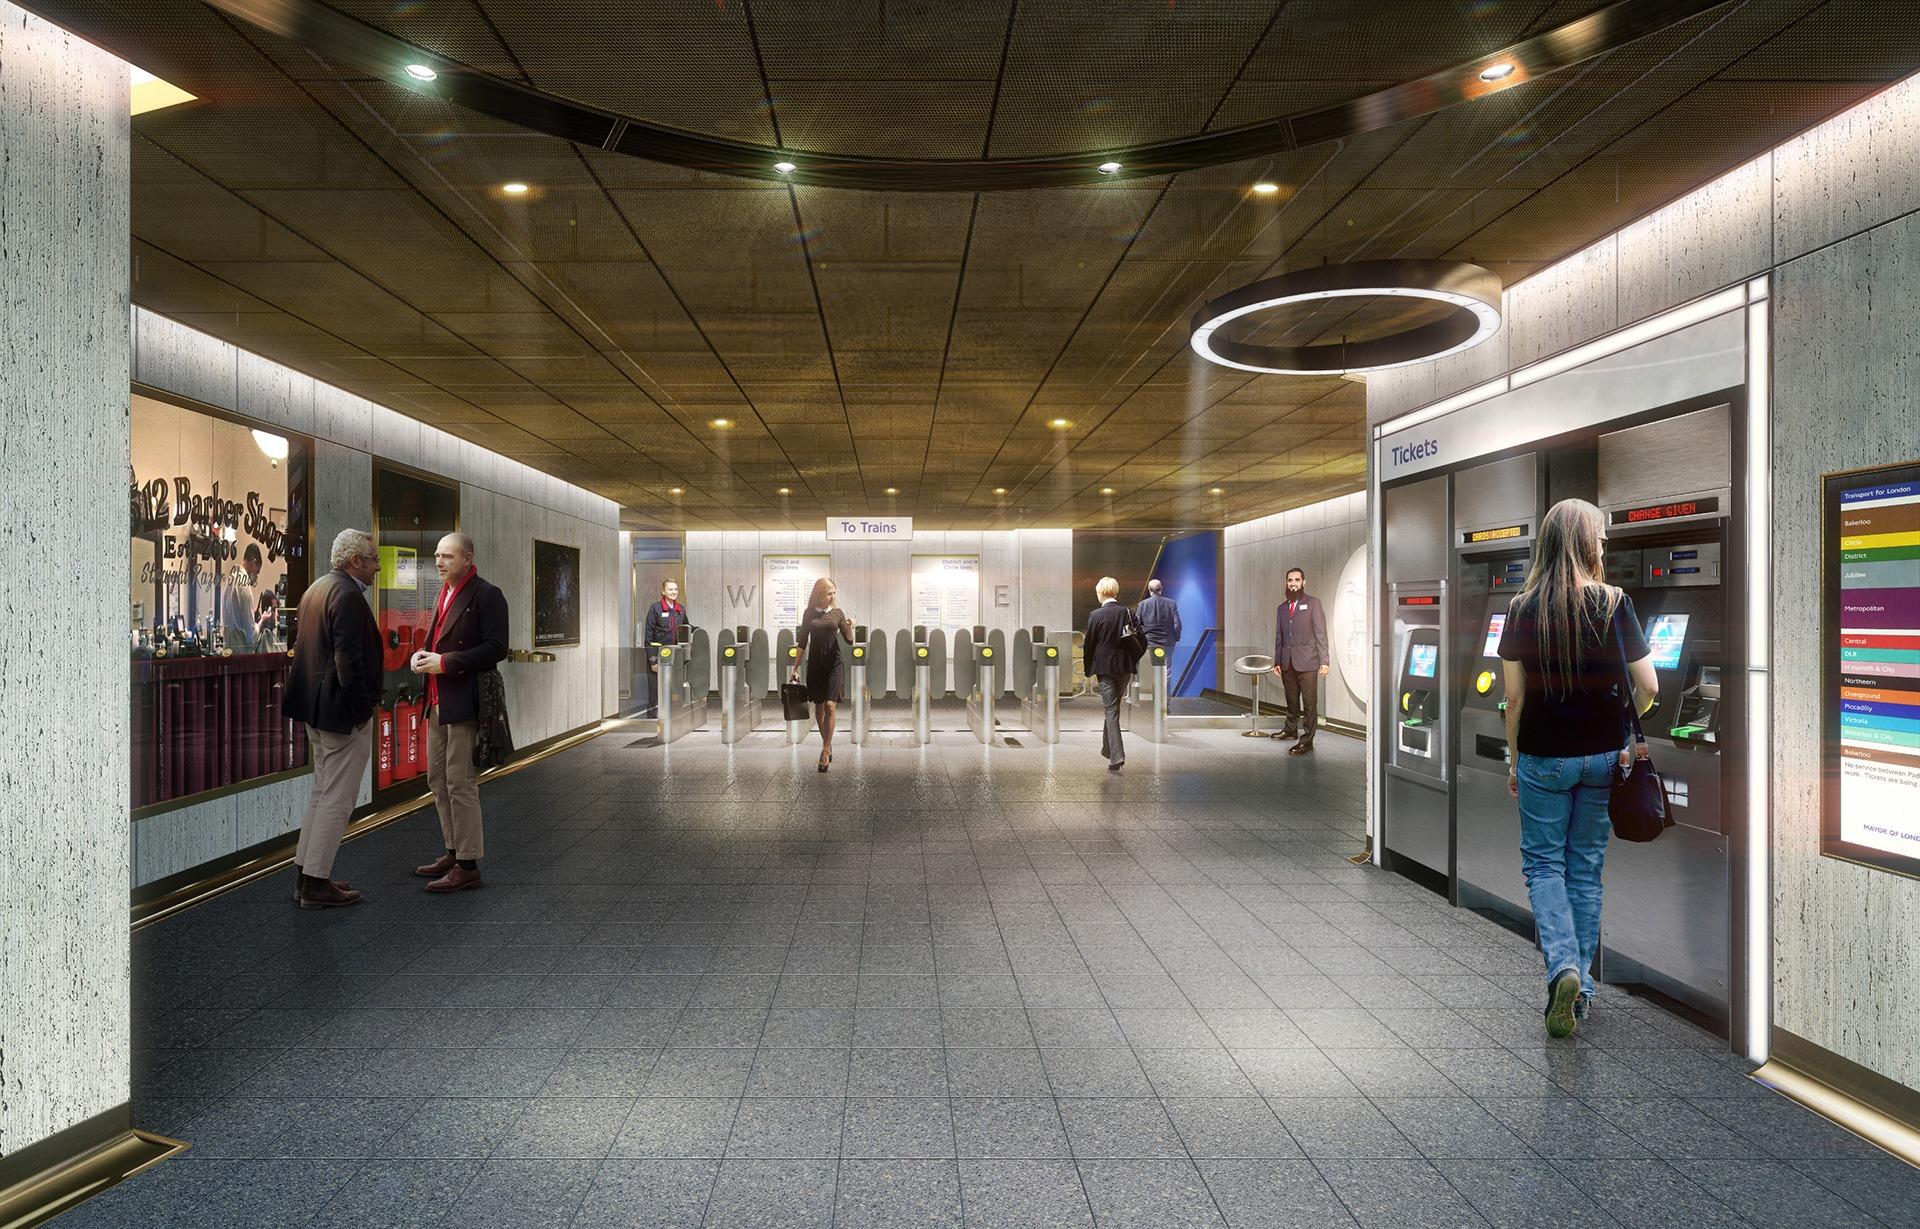 stas3dart-london-underground-ava-architecture-studio-egret-west-promotional-image-modelling-gallery4